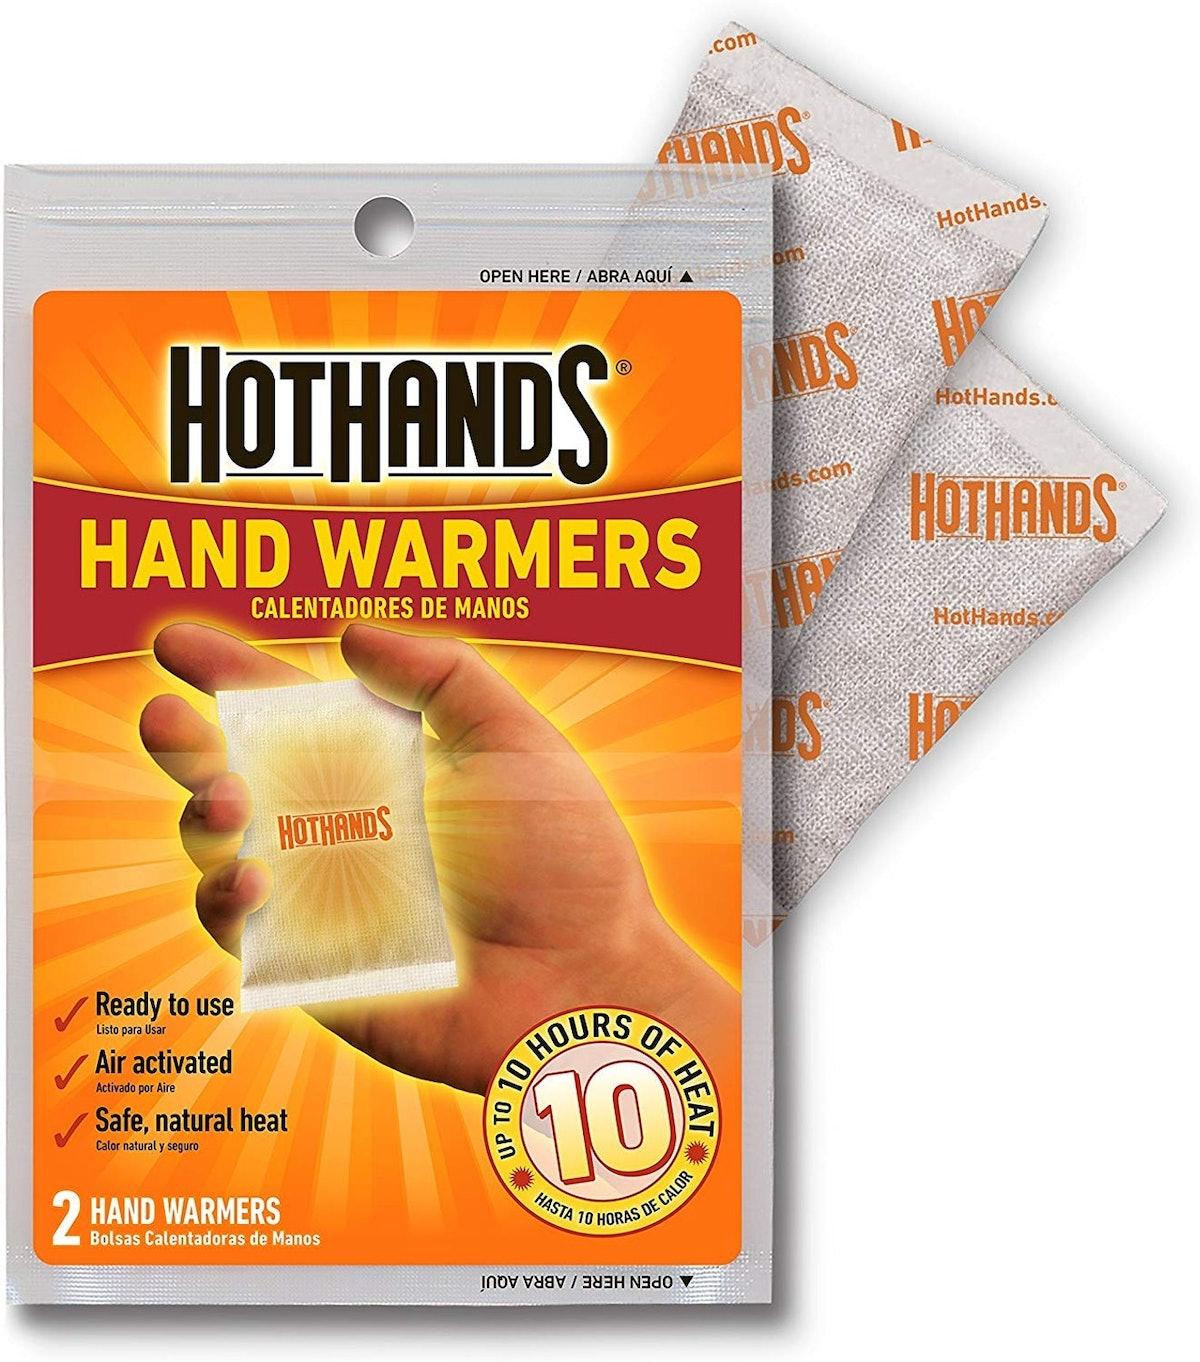 HeatMax Hot Hands Handwarmer (40 Pairs)